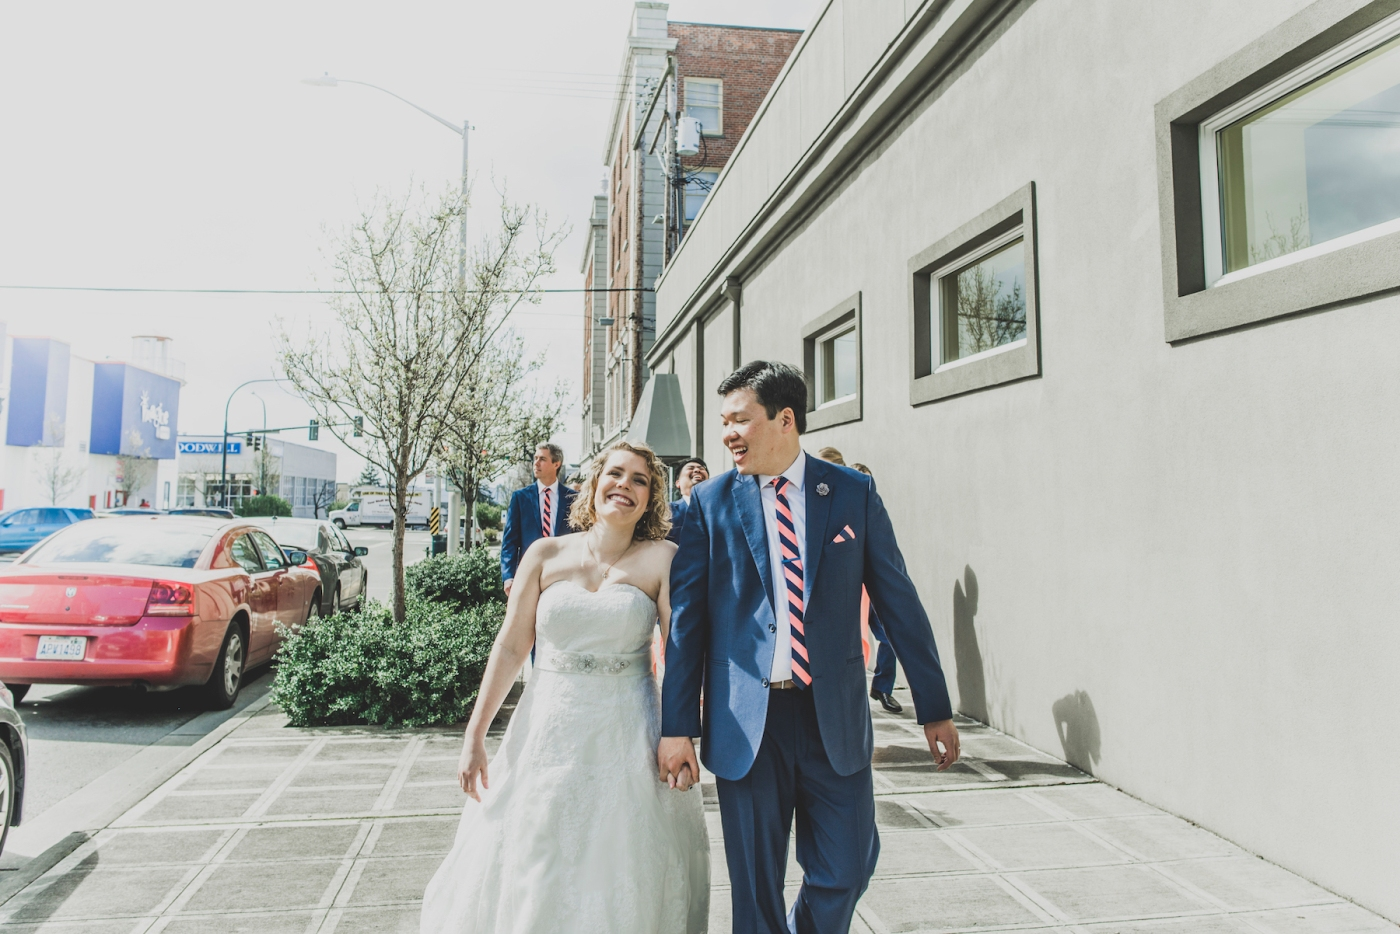 DSC_2163Everett_Wedding_Ballroom_Jane_Speleers_photography_Rachel_and_Edmund_Bridesmaids_peach_dresses_groomsmen_2017